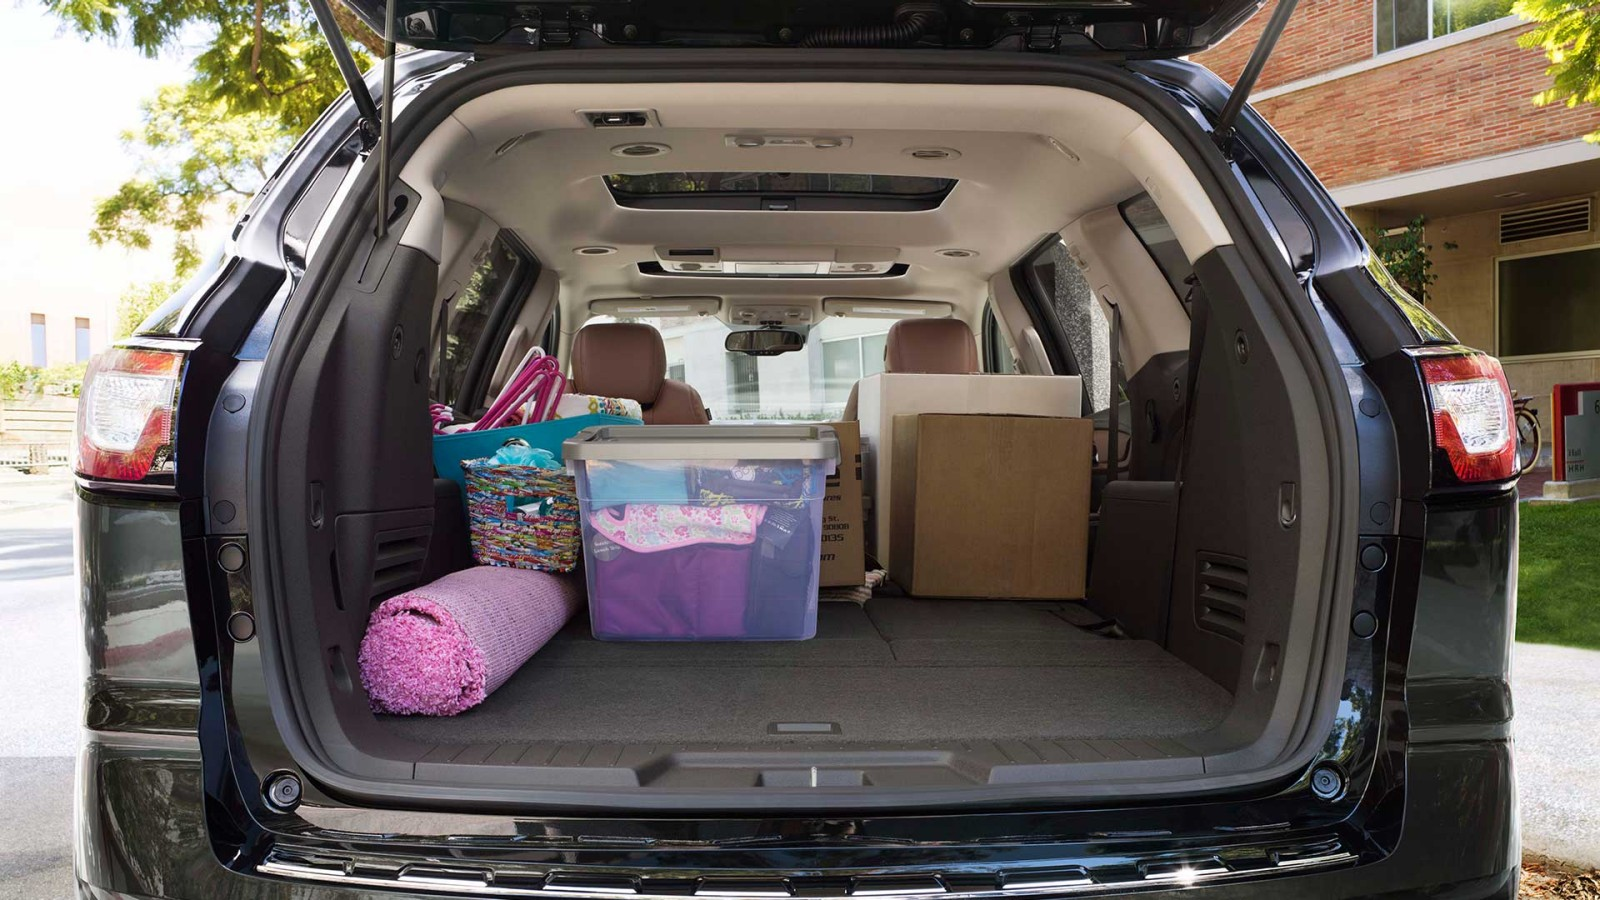 New Chevrolet Traverse Interior image 1